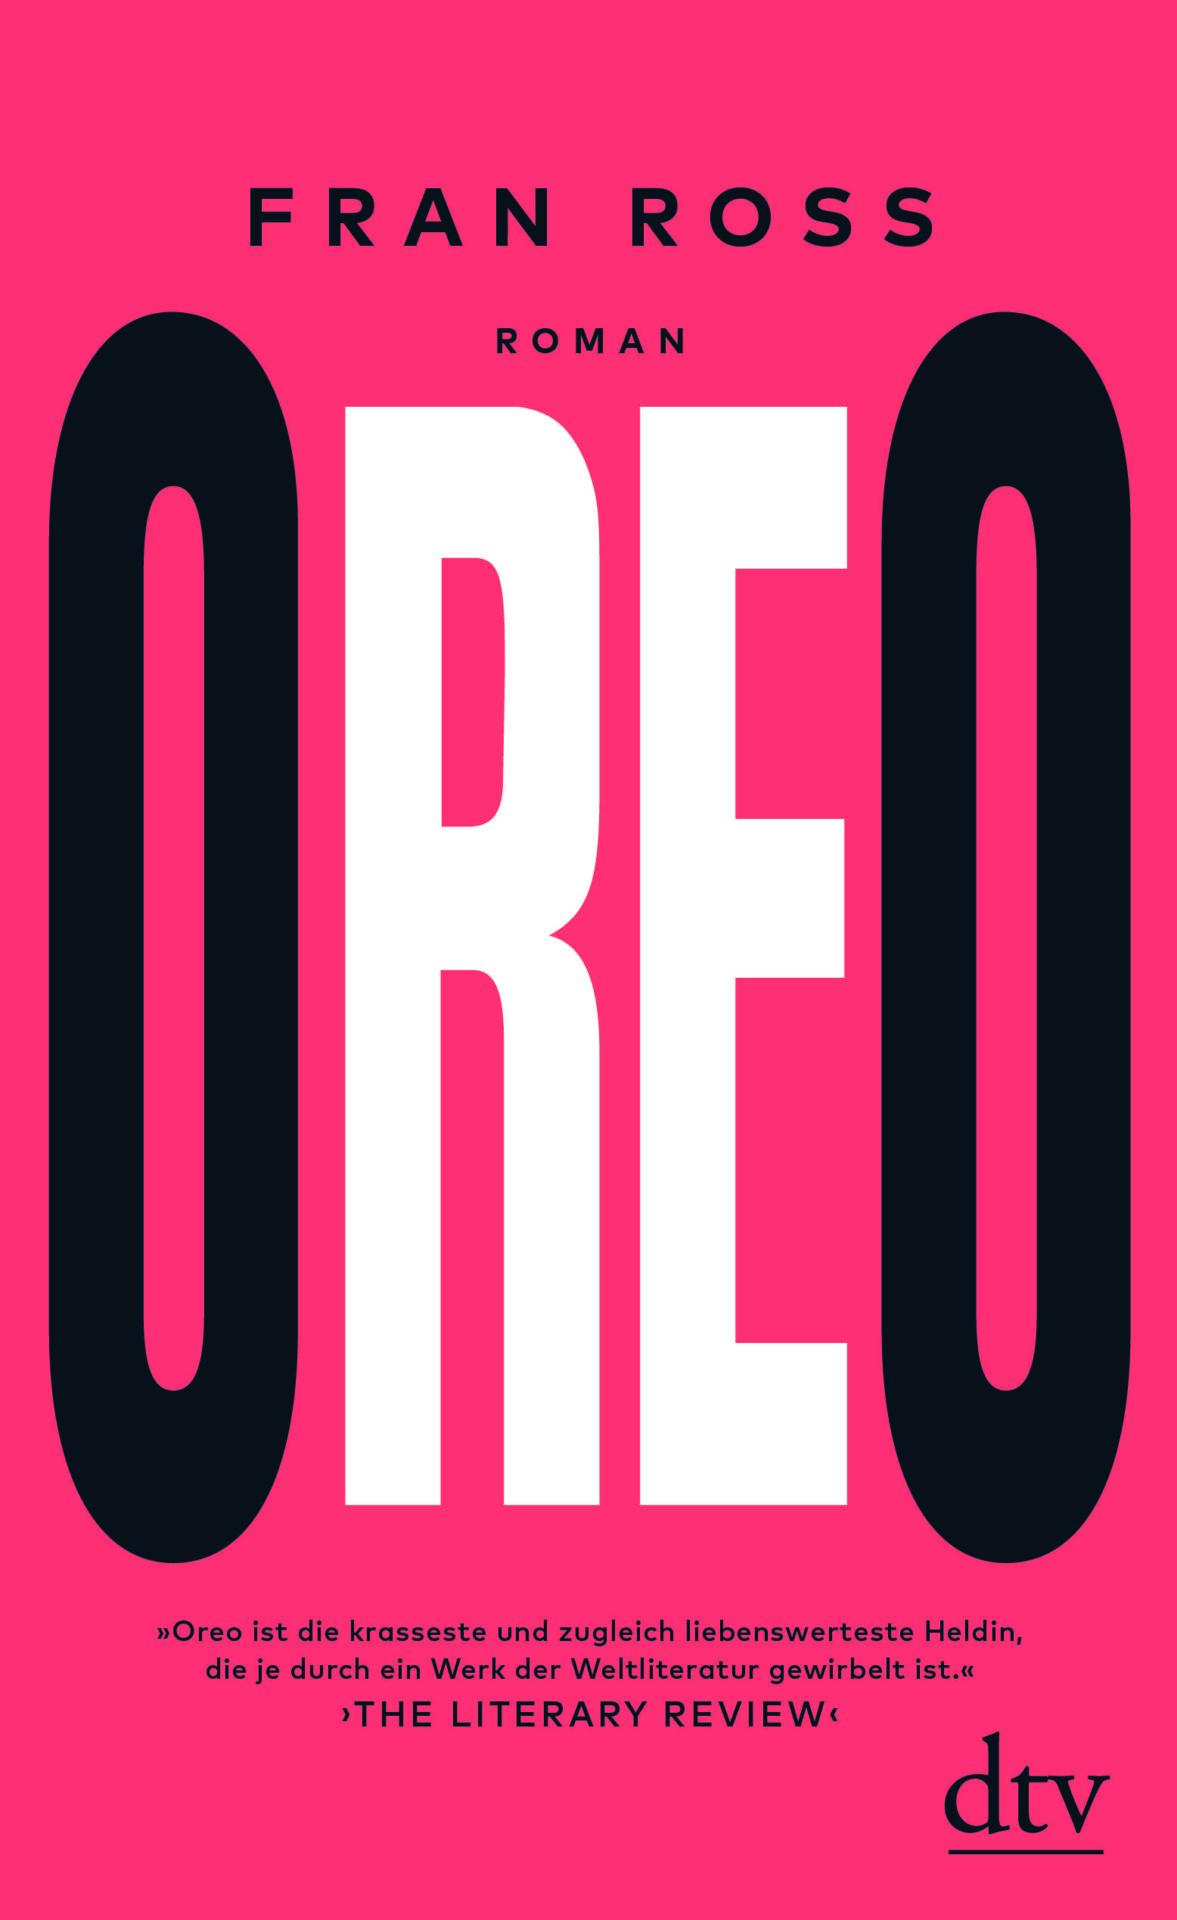 Fran Ross: OREO